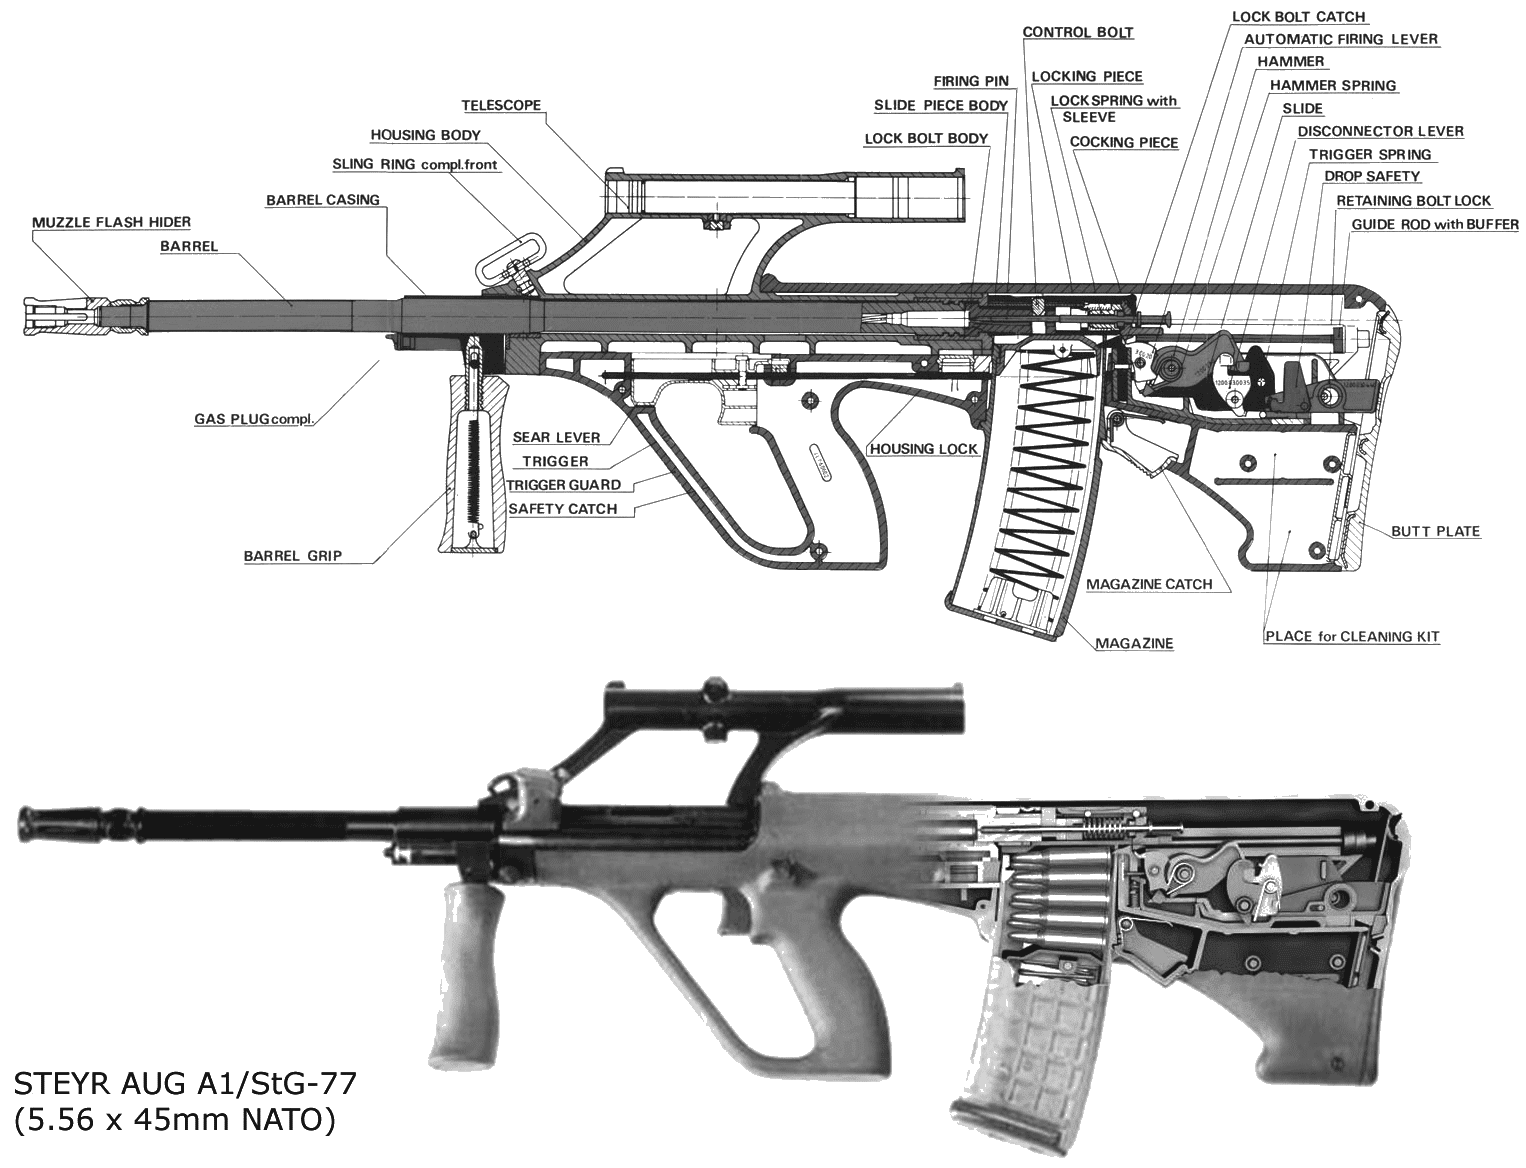 The Keyzone Rifle Steyr Aug